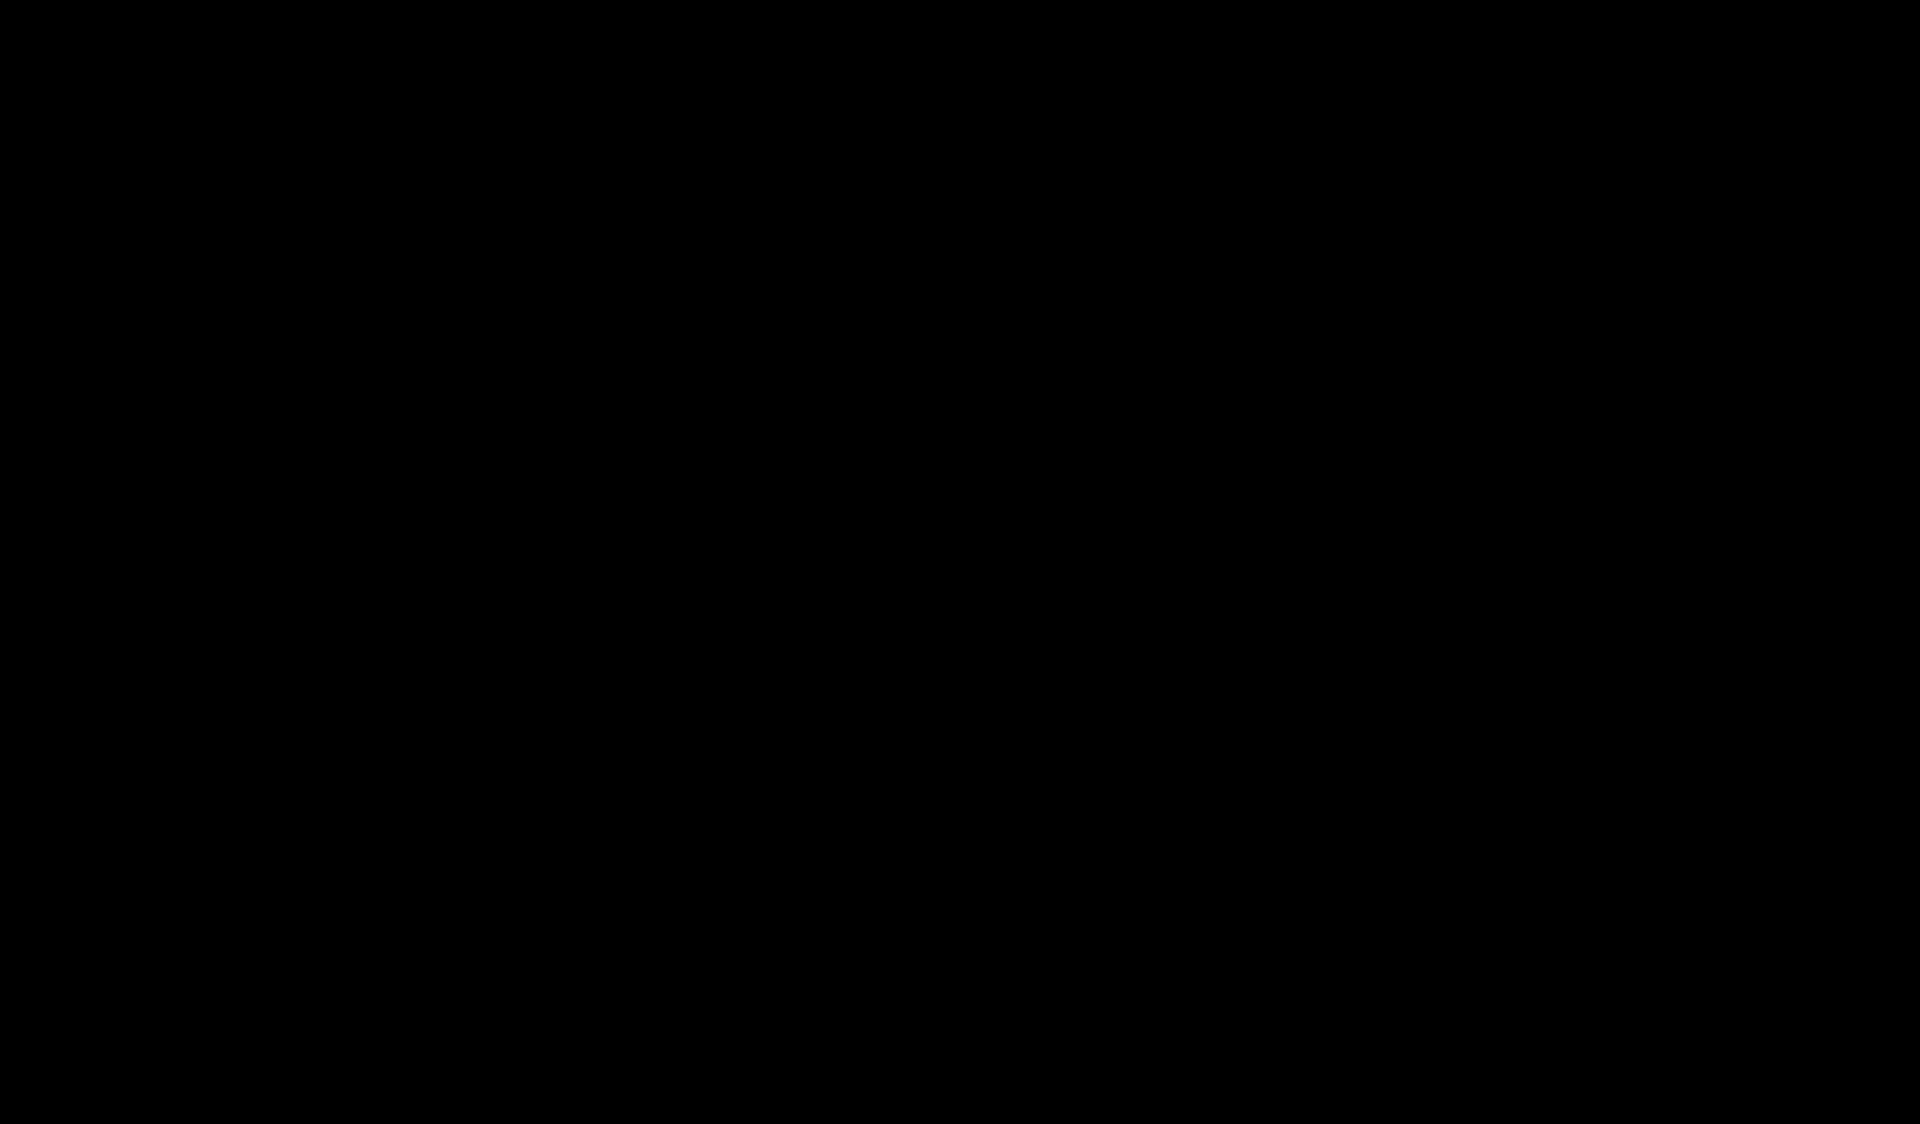 Into the Abyss – Logo, Album Concept & Artwork